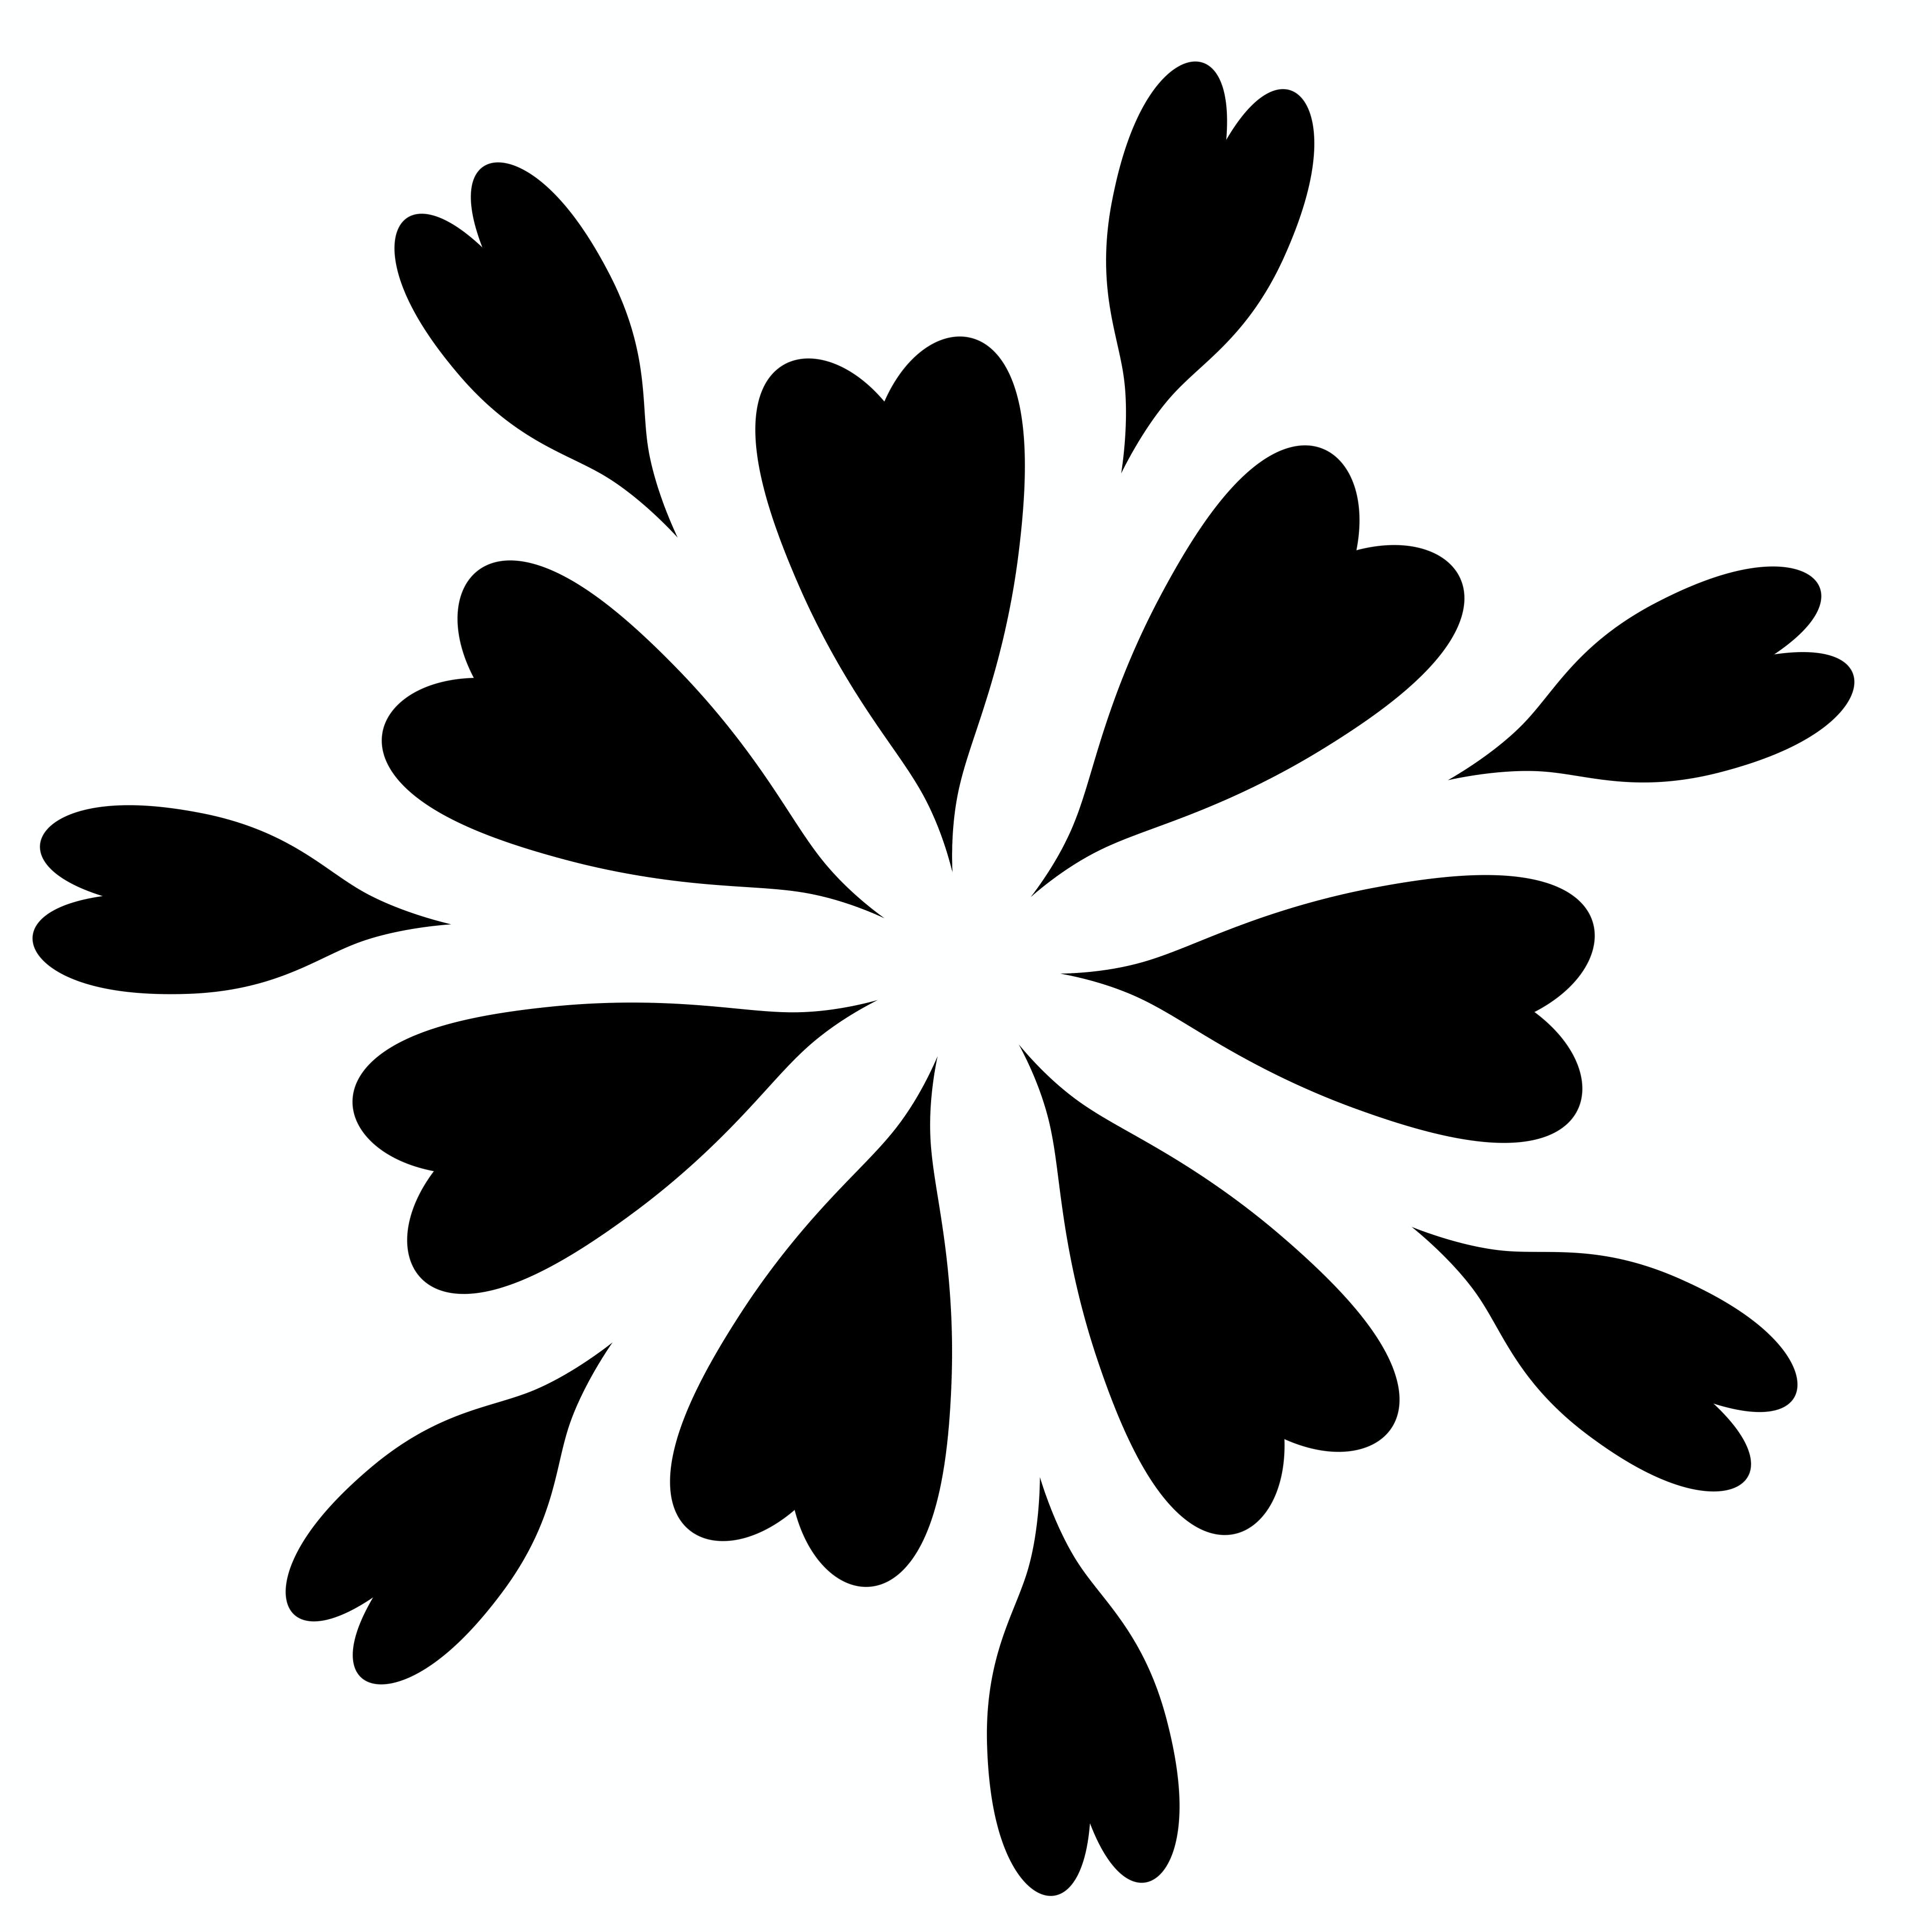 Free stock photo of circular, design, designing, graphic